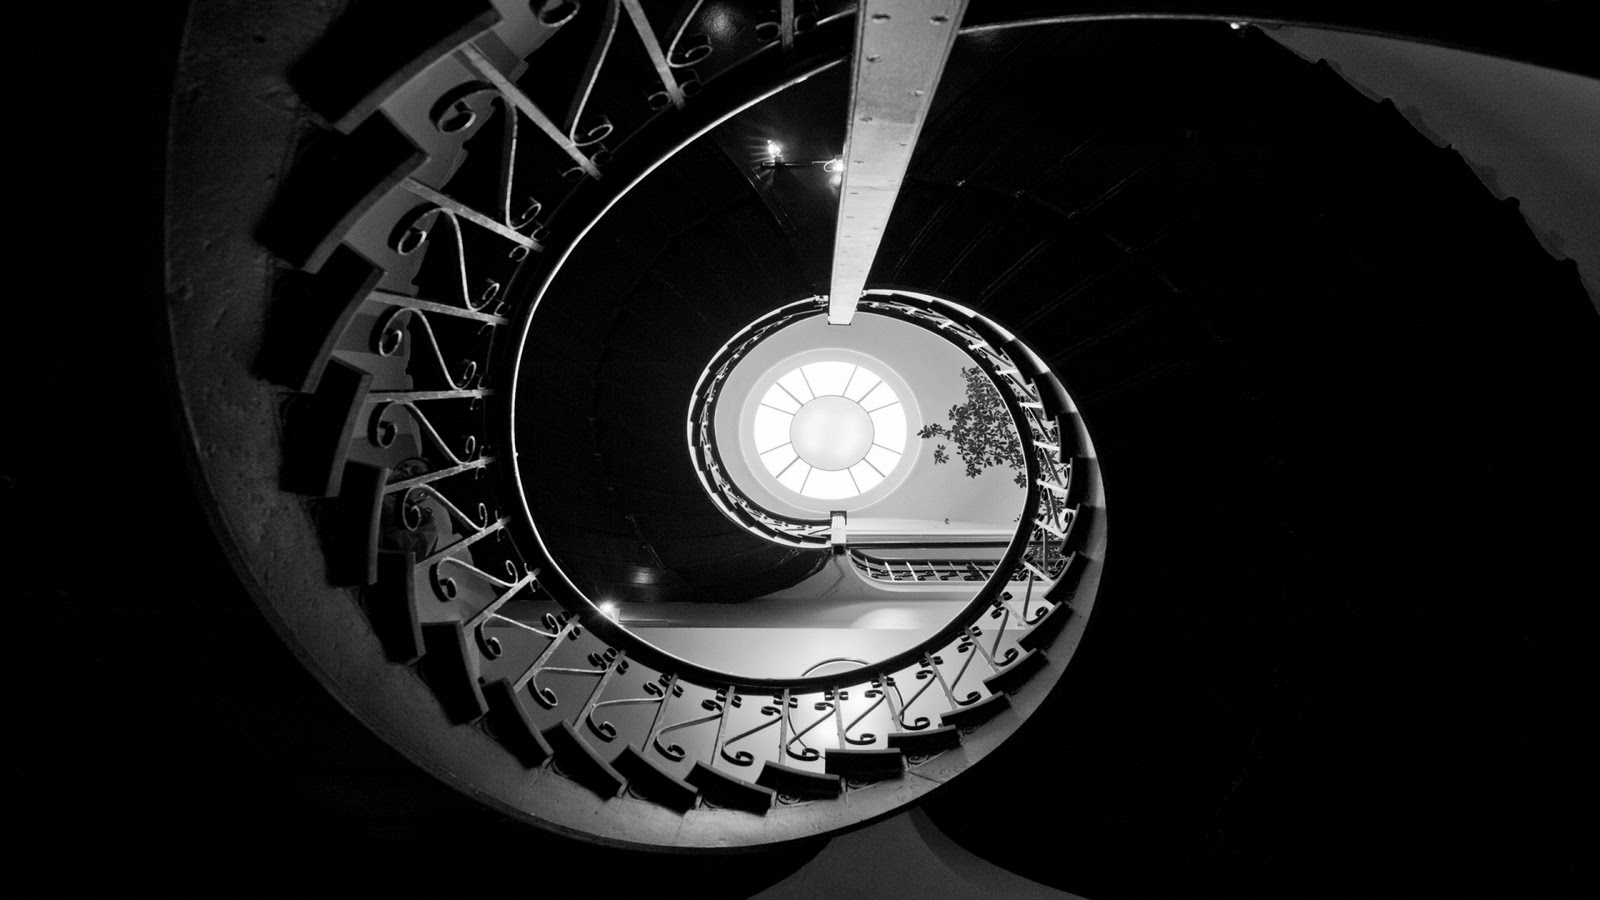 http://1.bp.blogspot.com/-SEO5fdEuSZE/TvouZbXgyHI/AAAAAAAAFhM/1-iqNyIsx7o/s1600/carnegie_staircase-1920x1080.jpg